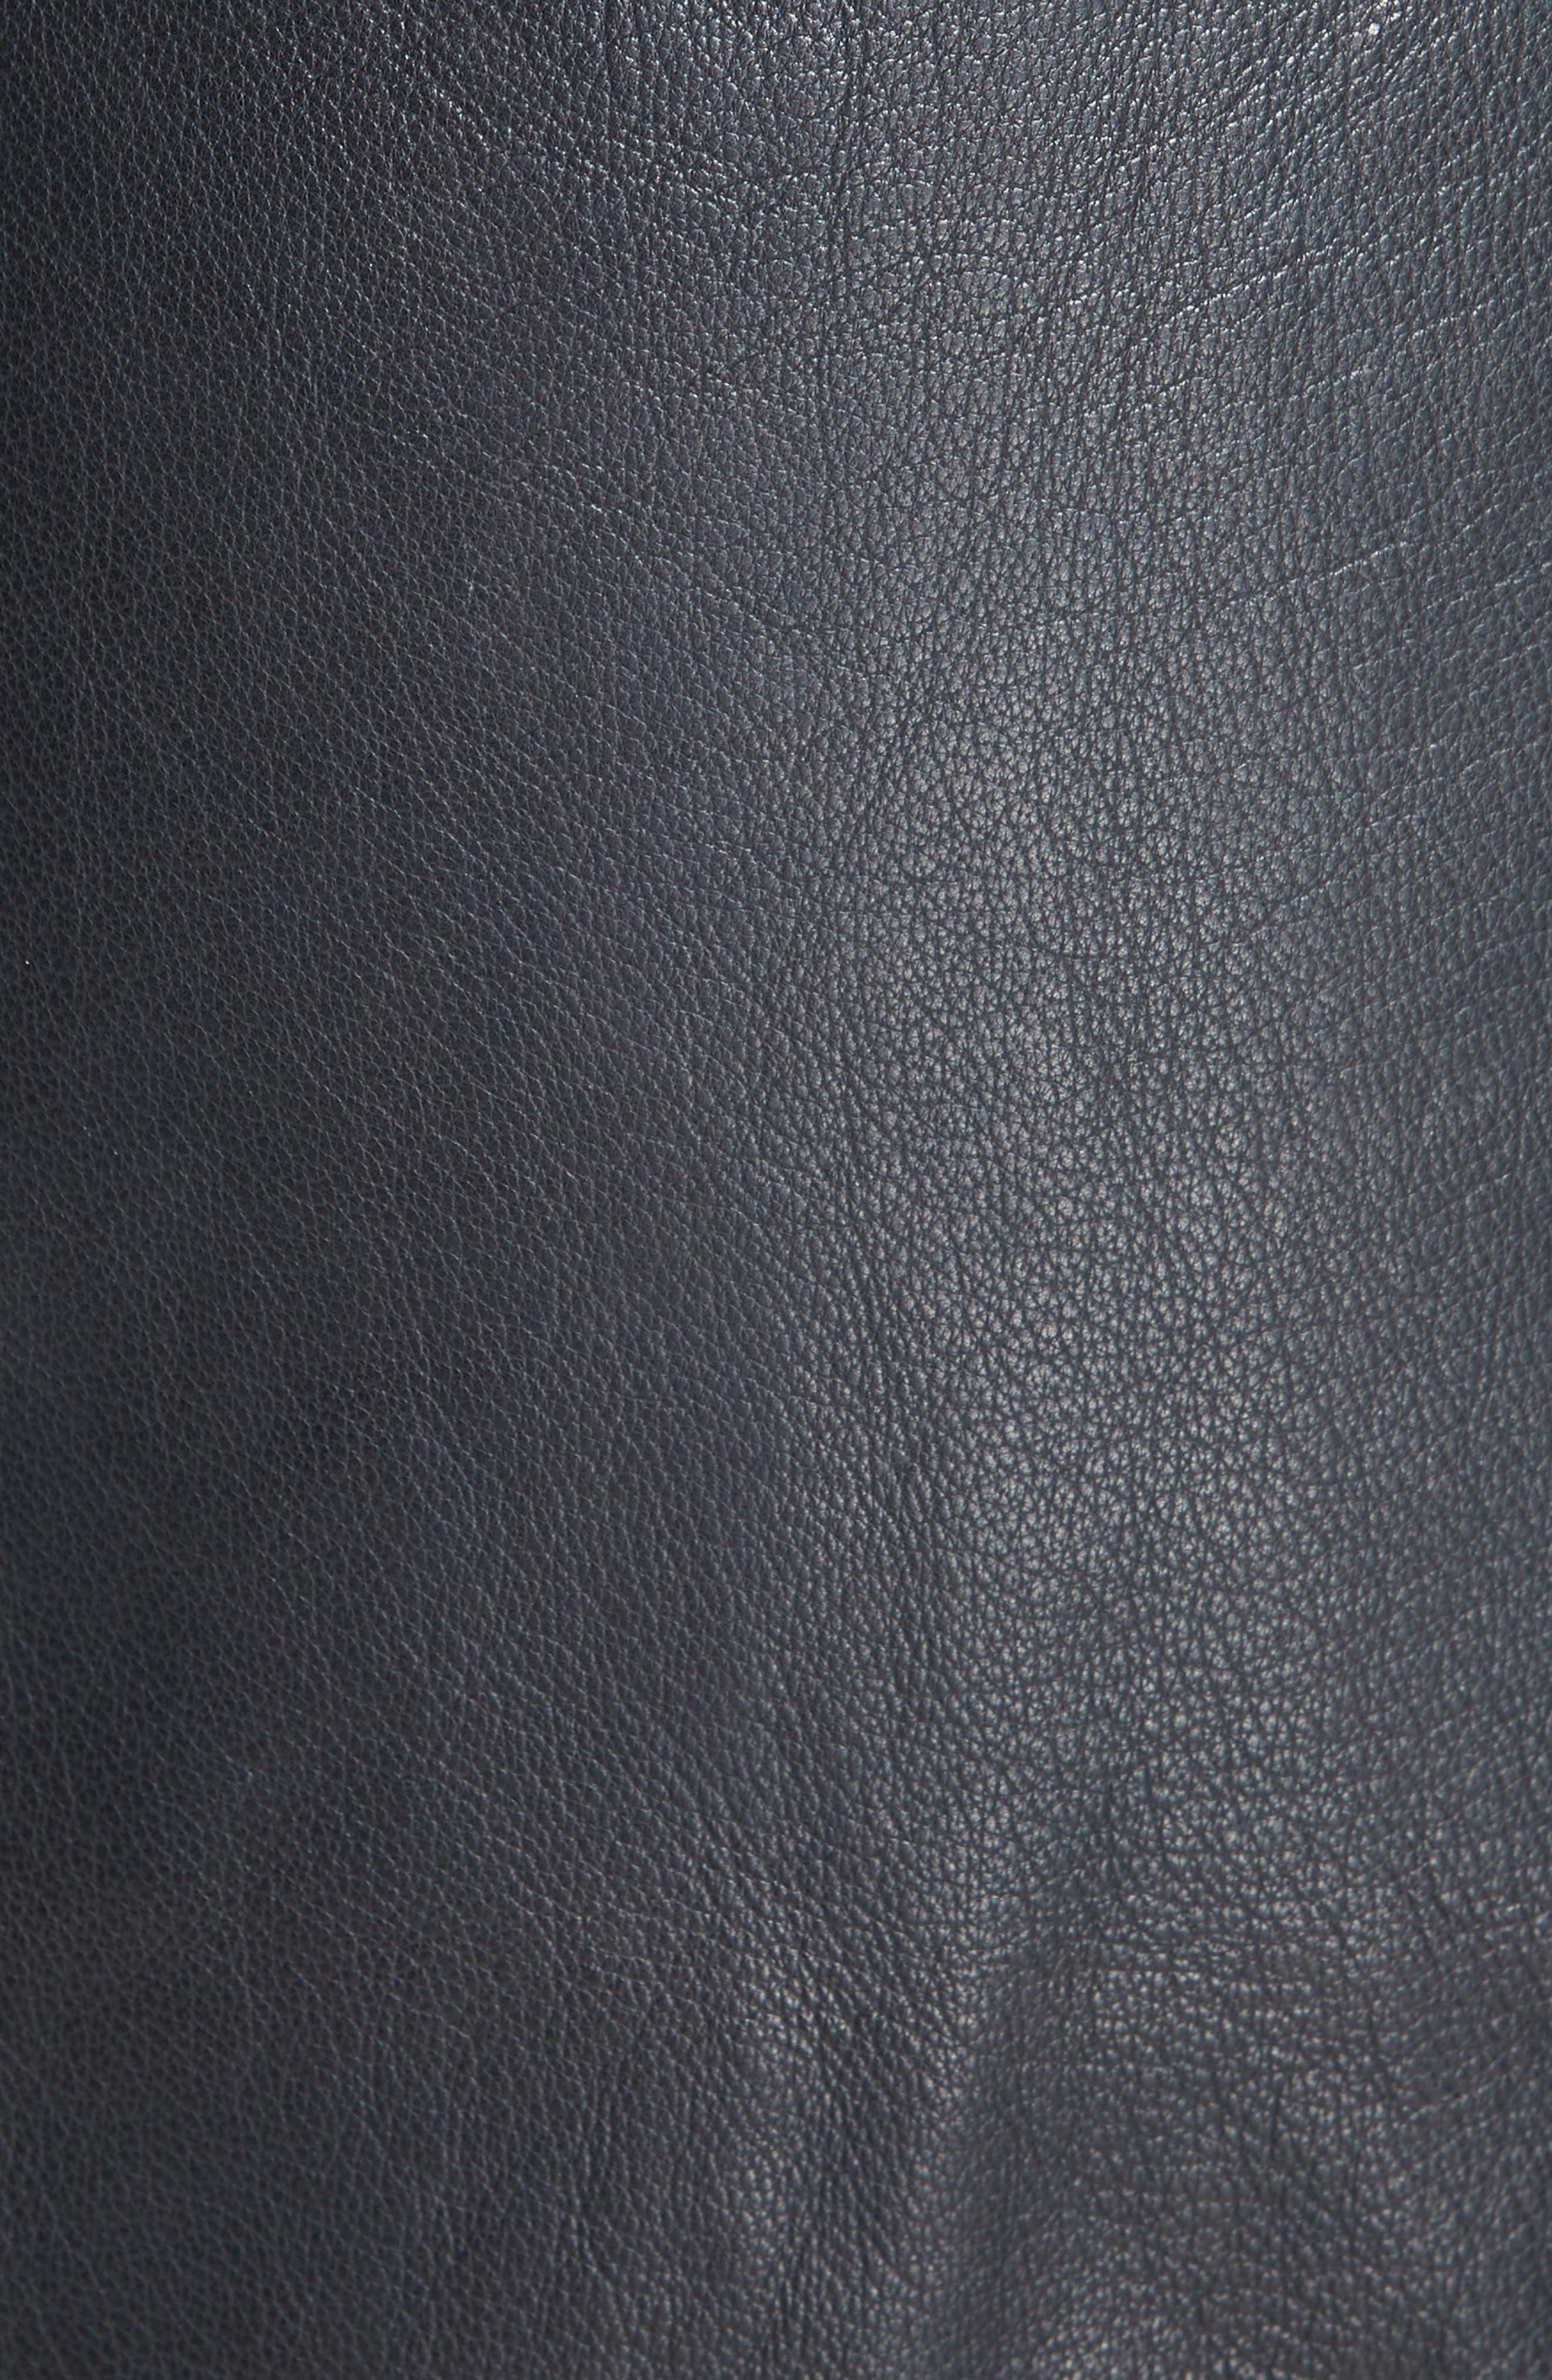 Magic Wrap Leather Skirt,                             Alternate thumbnail 5, color,                             BLACK